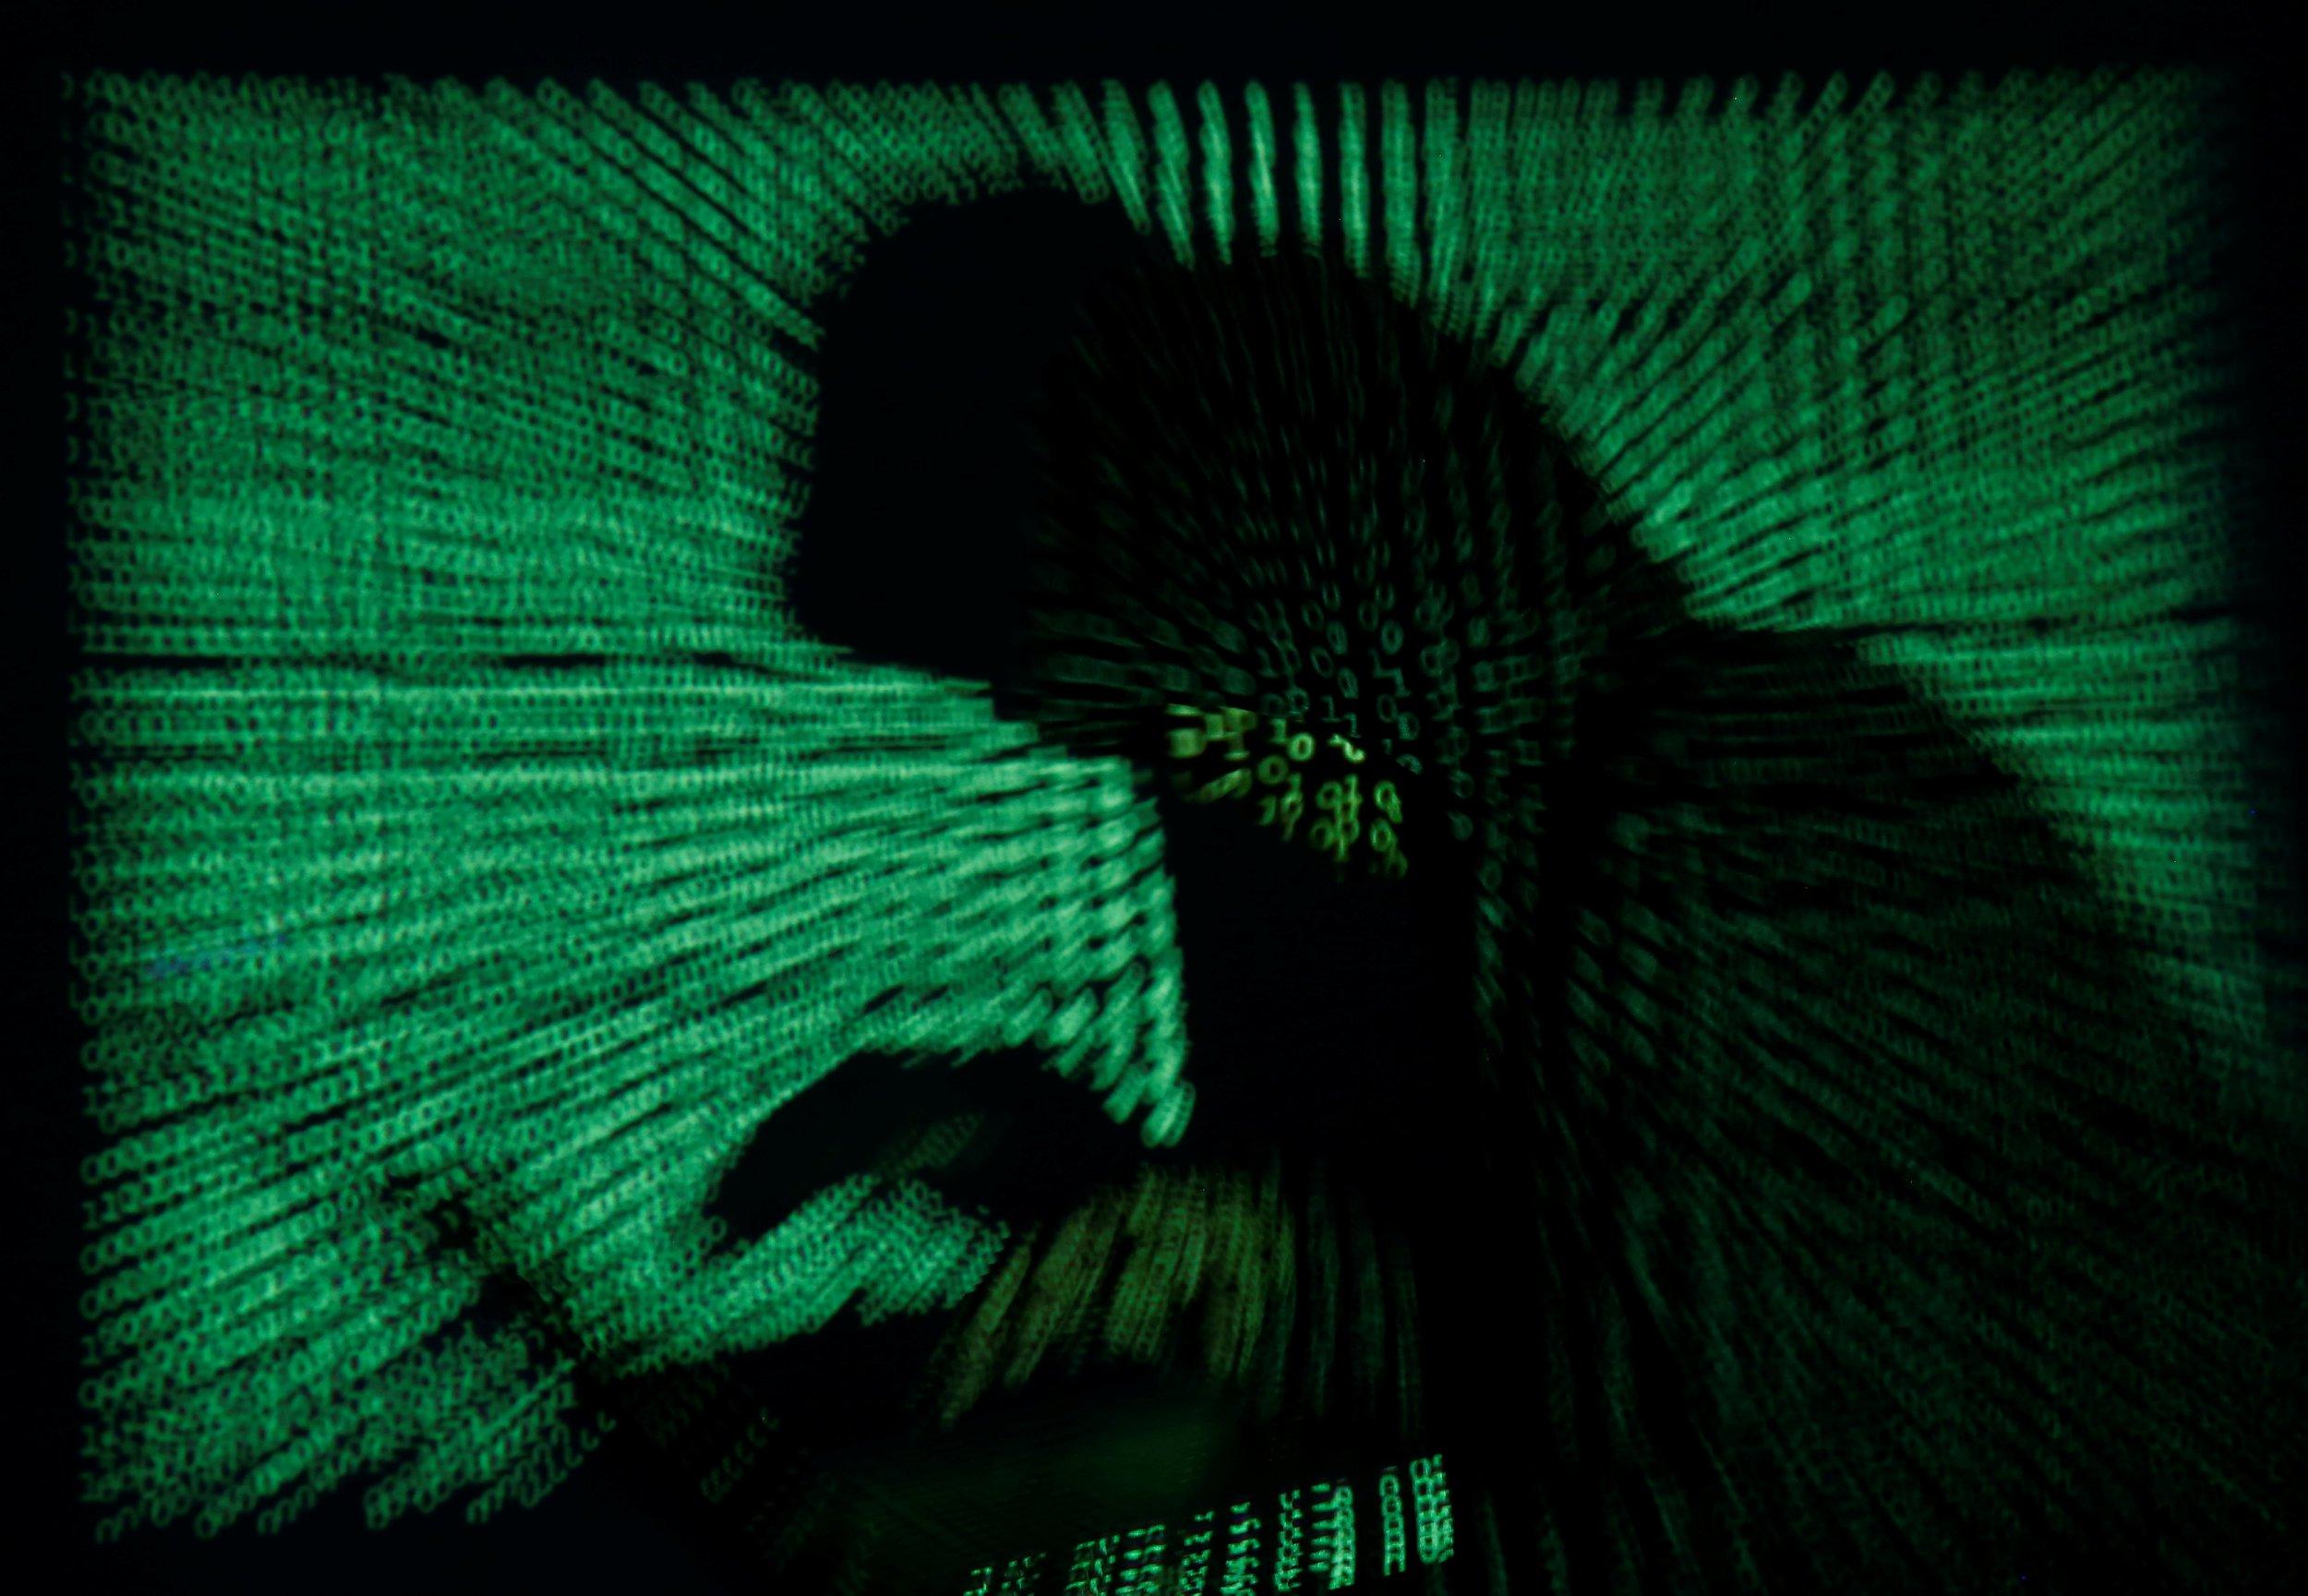 Criminals choosing cryptocurrencies like Monero, ZCash and Dash over Bitcoin, Europol warns